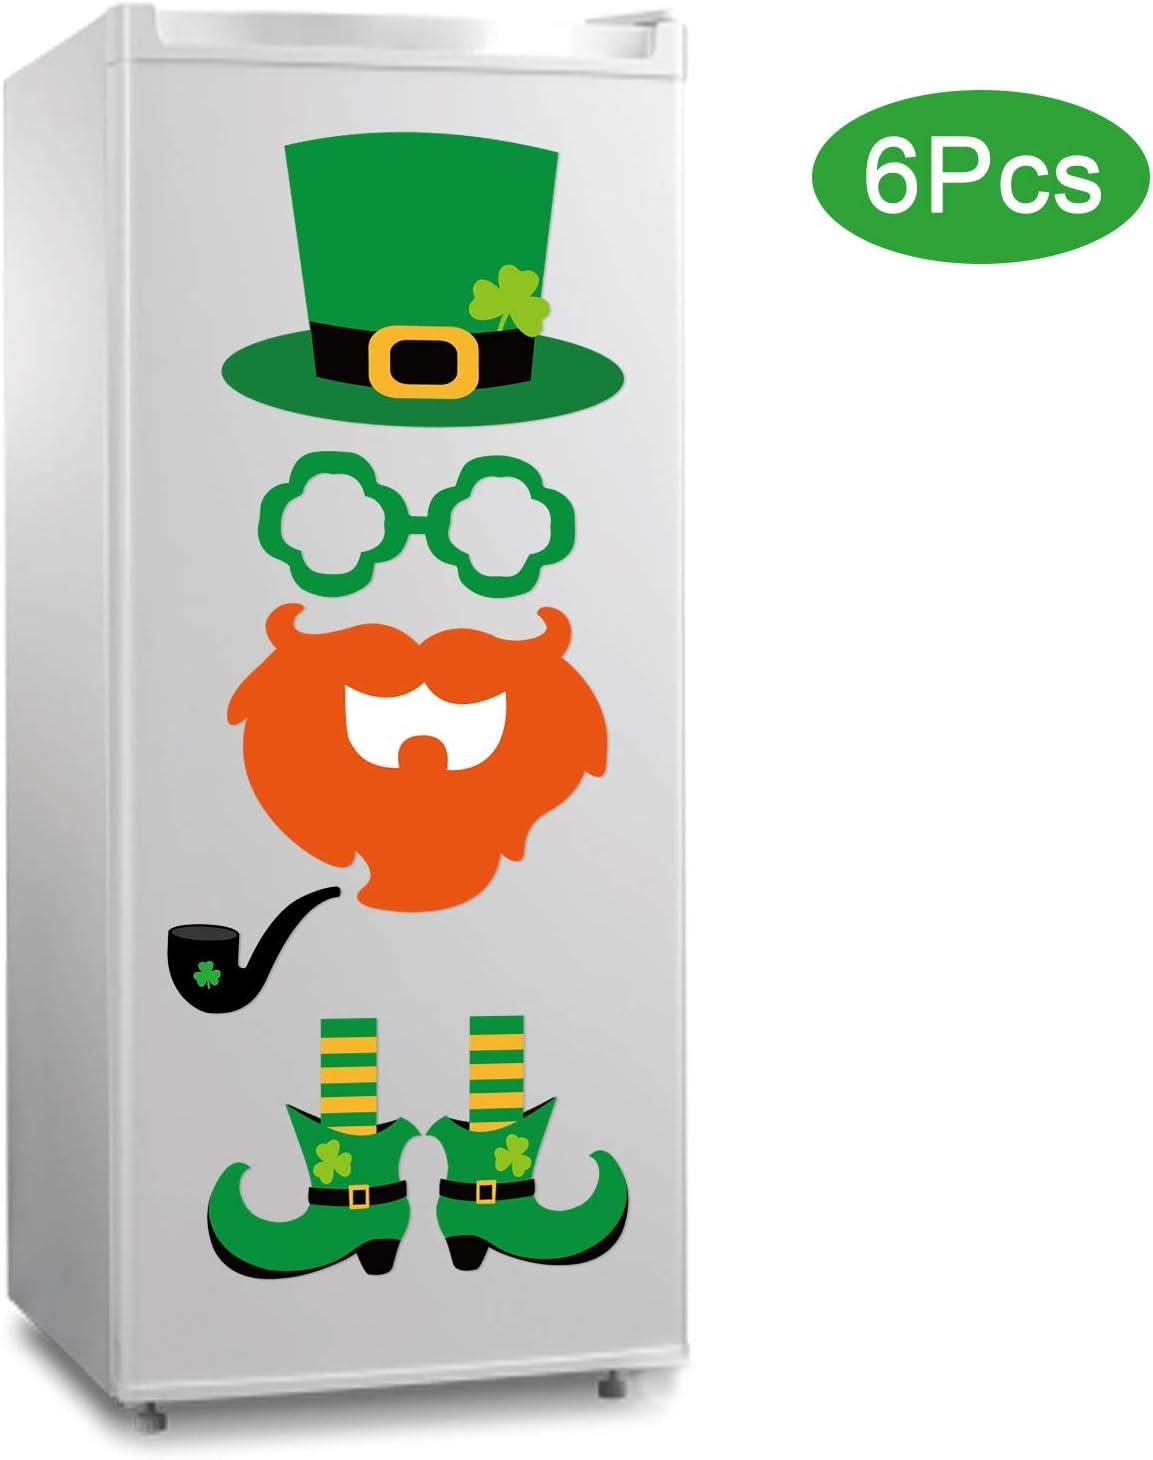 6Pcs St. Patrick's Day Refrigerator Magnets| St. Patrick's Day Decorations| Large Leprechaun Fridge Magnet Sticker| Irish Party Shamrock Decor| St. Patrick's Day Decor for Fridge Metal Door Cabinet